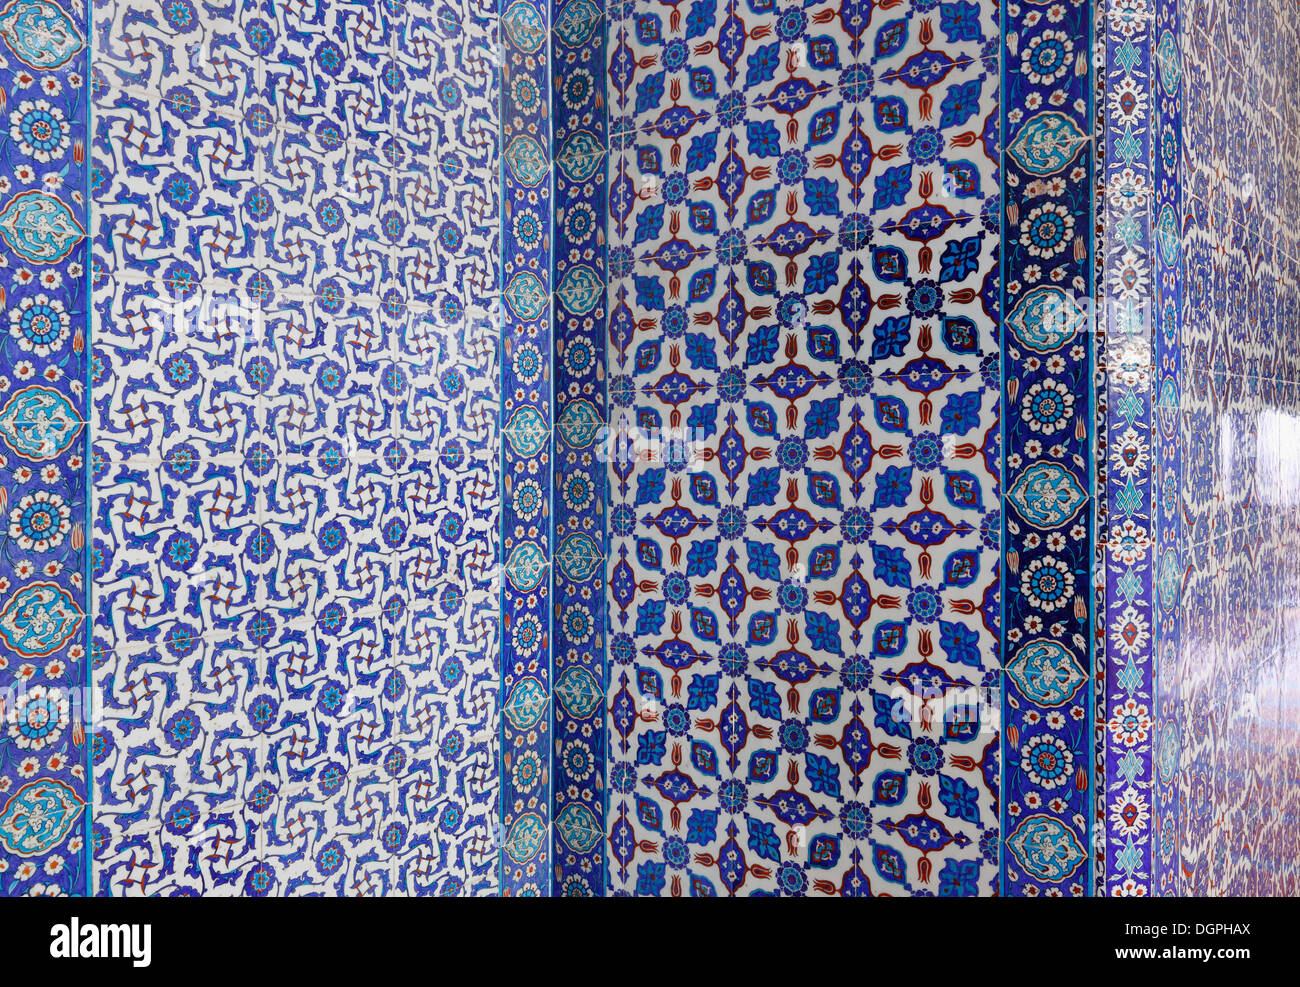 Faience tiles stock photos faience tiles stock images alamy